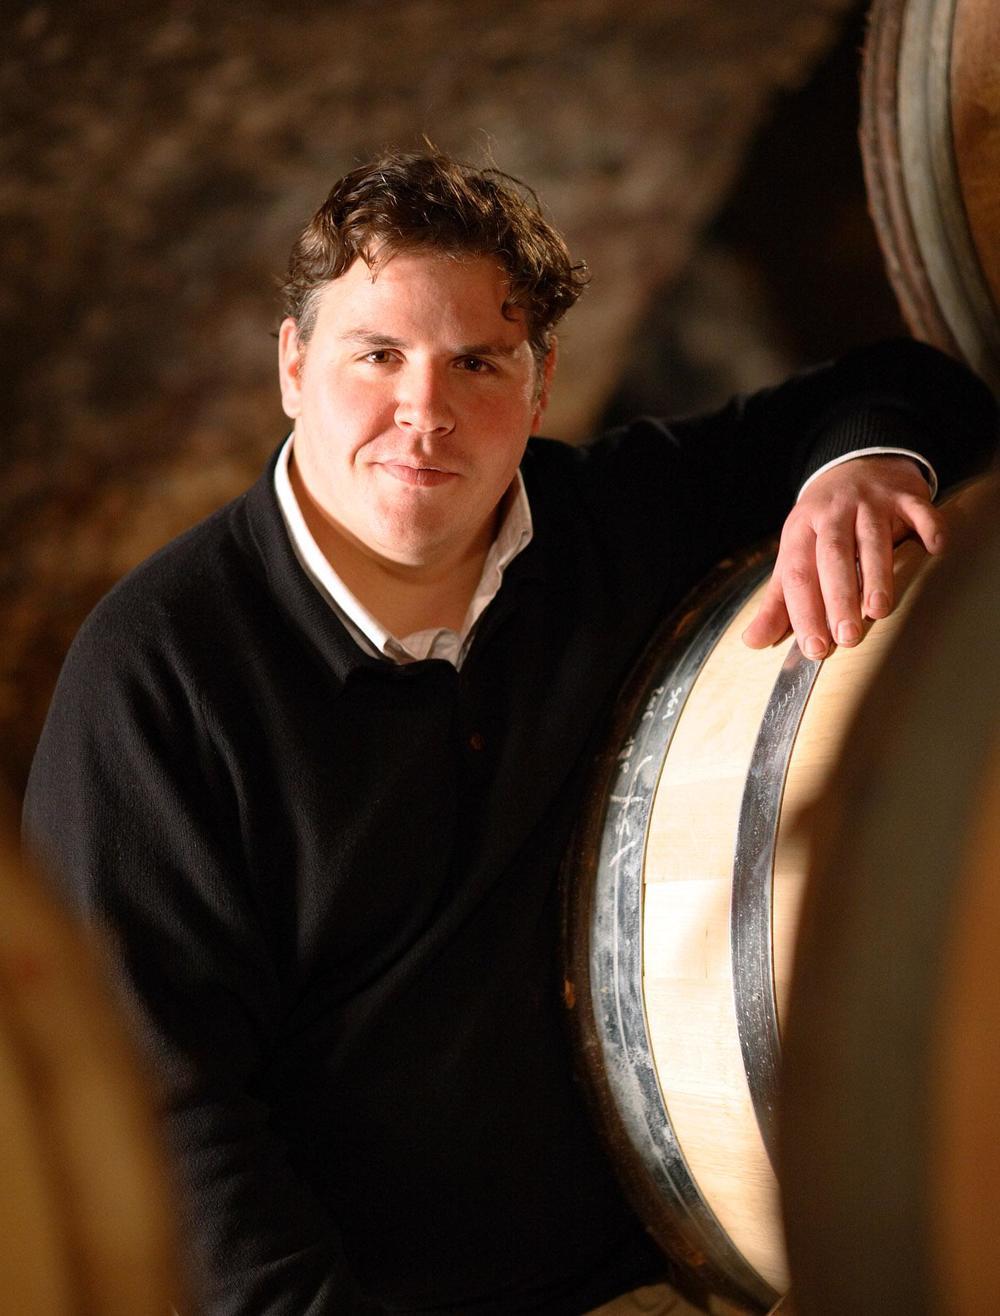 Winemaker Thibault Liger-Belair (PHOTO: domaine thibault liger-belair)